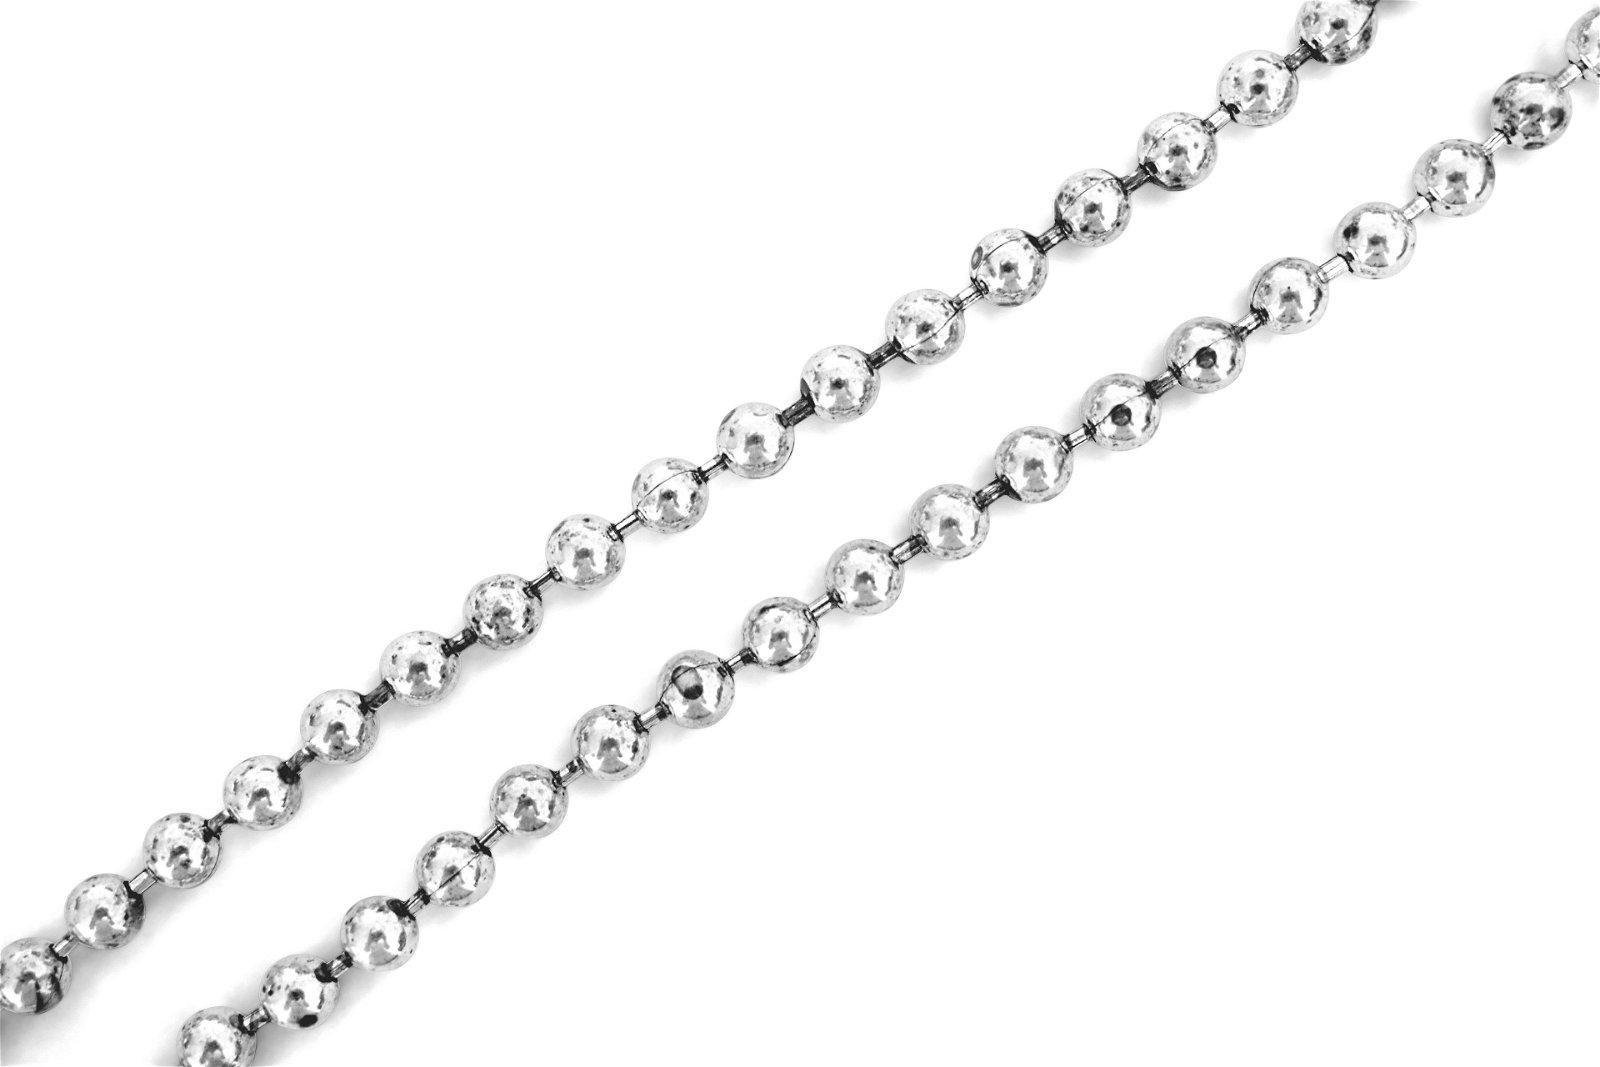 Vintage ITALIAN 925 Sterling Silver Ladies Necklace